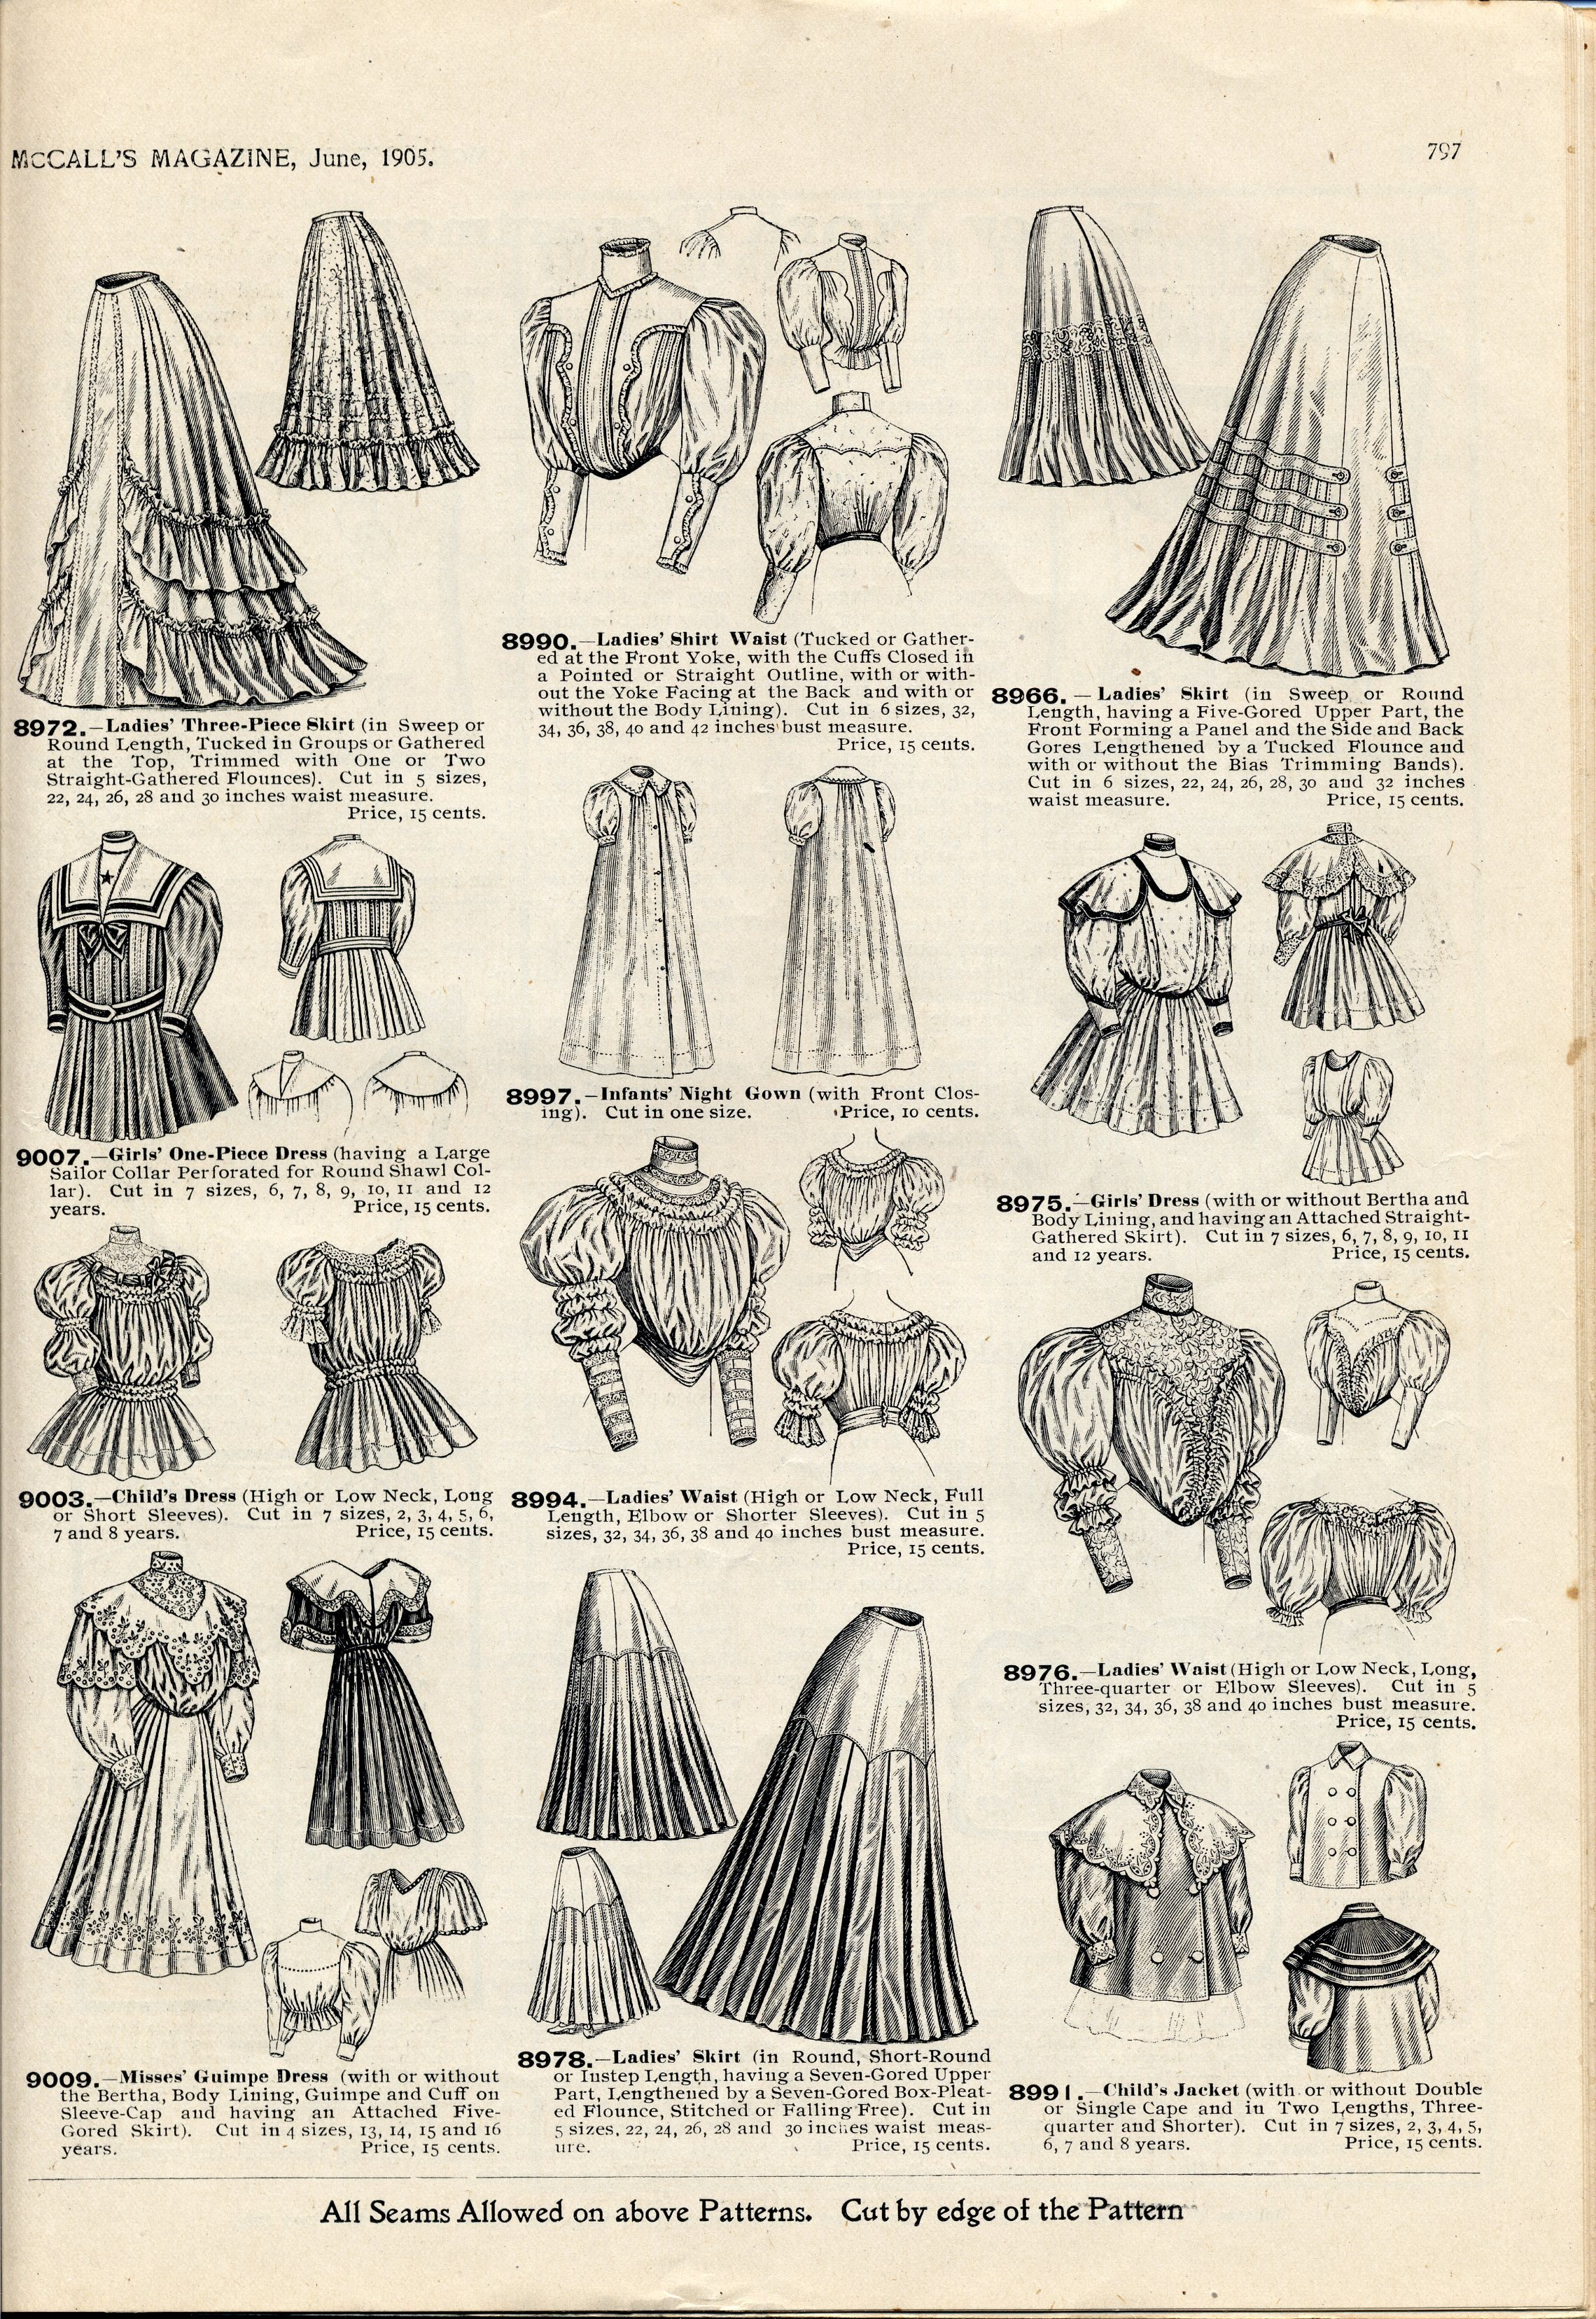 night dress, victorian night  dress, old fashion night dress, underwear, victorian underwear, old fashion underwear,  skirt, victorian skirt, old fashion skirt,   blouse, victorian blouse, old fashion blouse,   dress, victorian dress, old fashion dress,   clothes, victorian clothes, old fashion clothes,